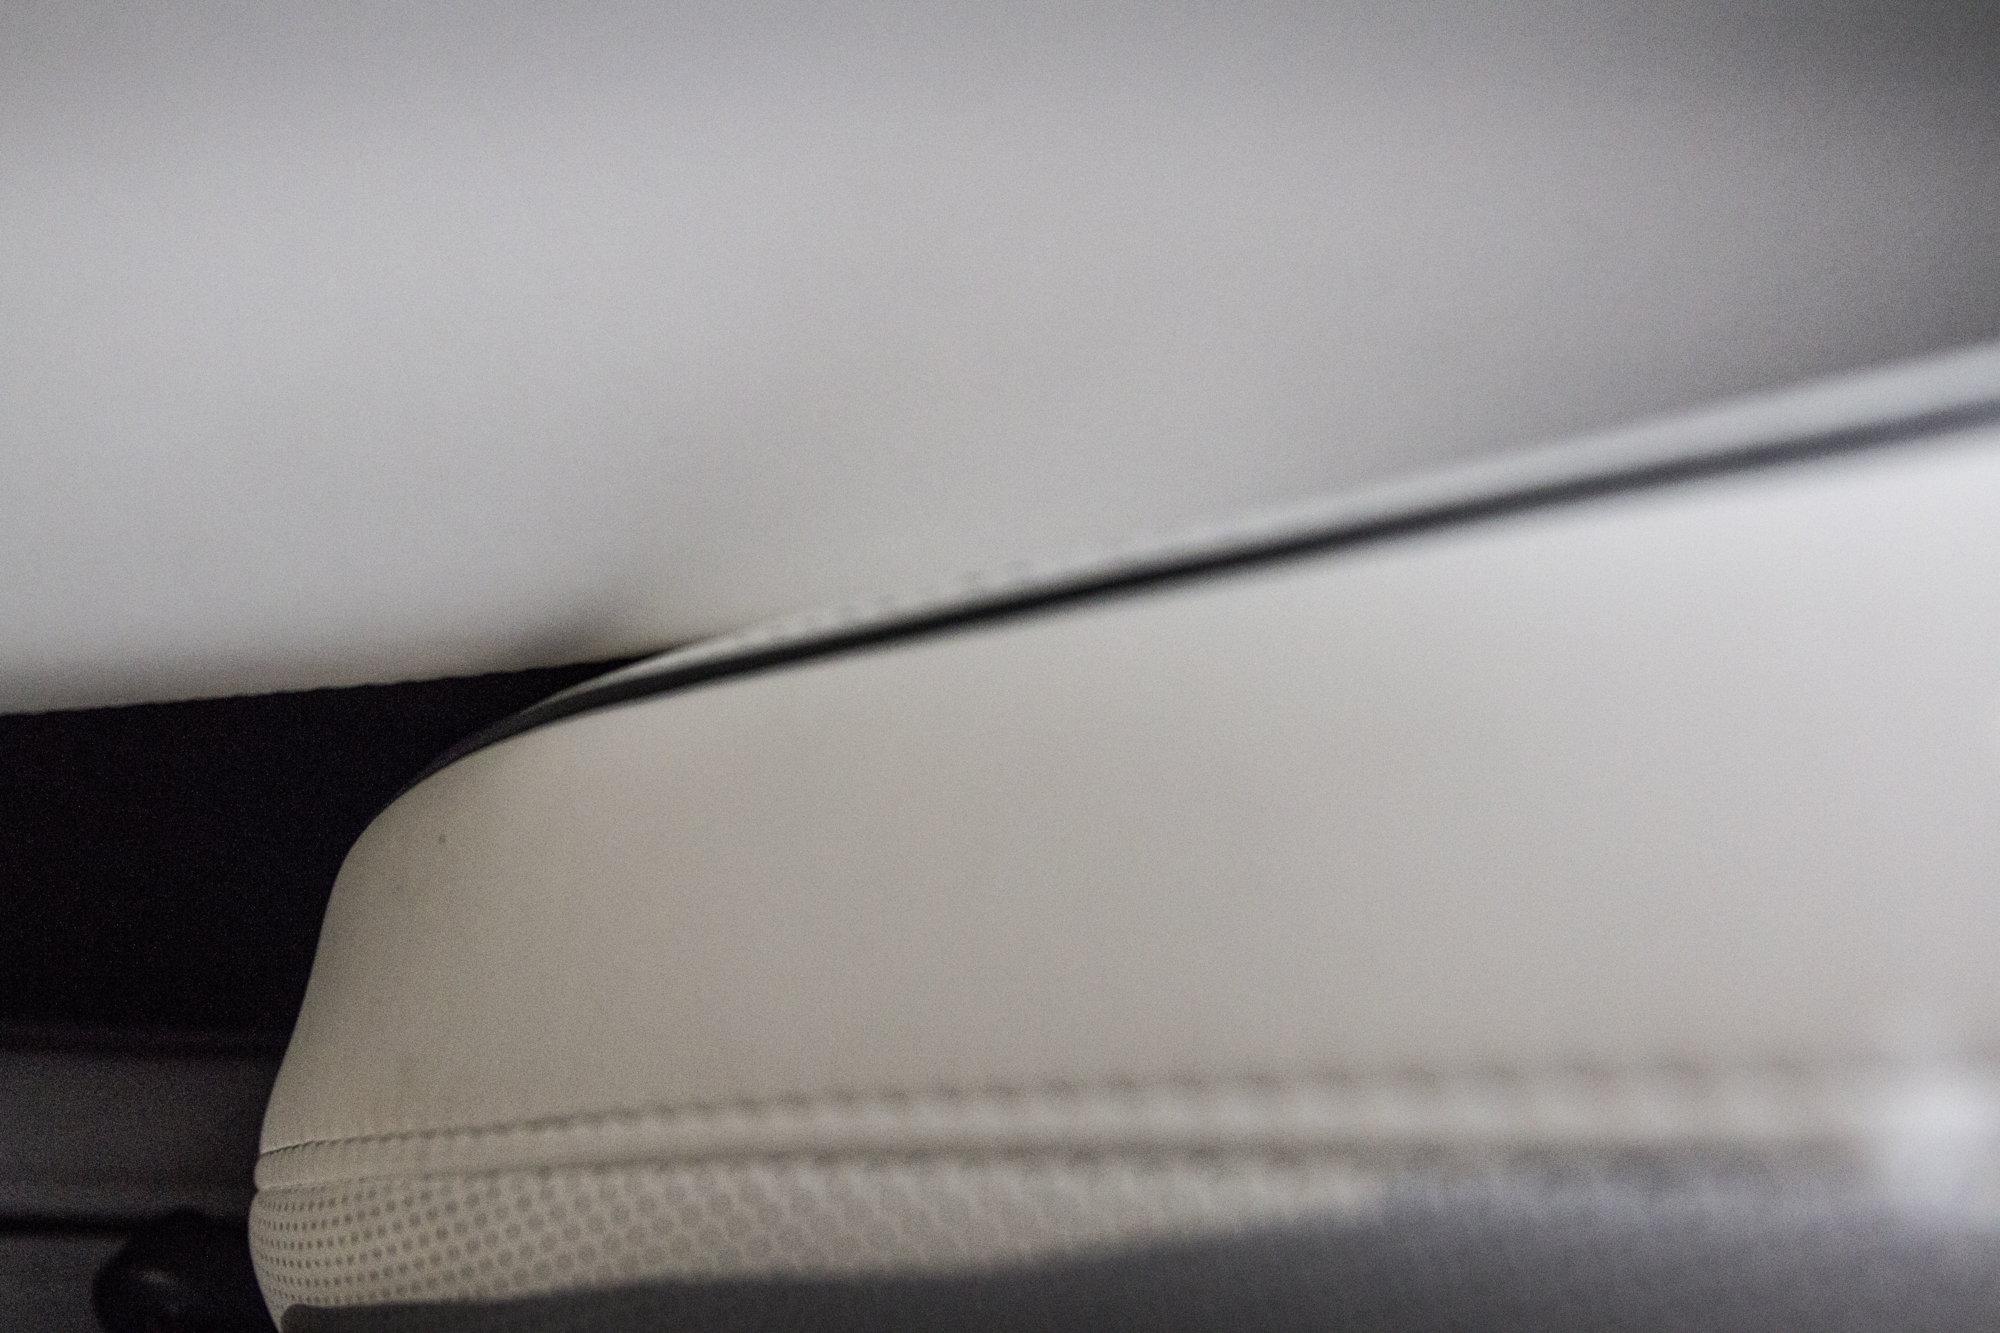 Seat Rubbing 2.JPG